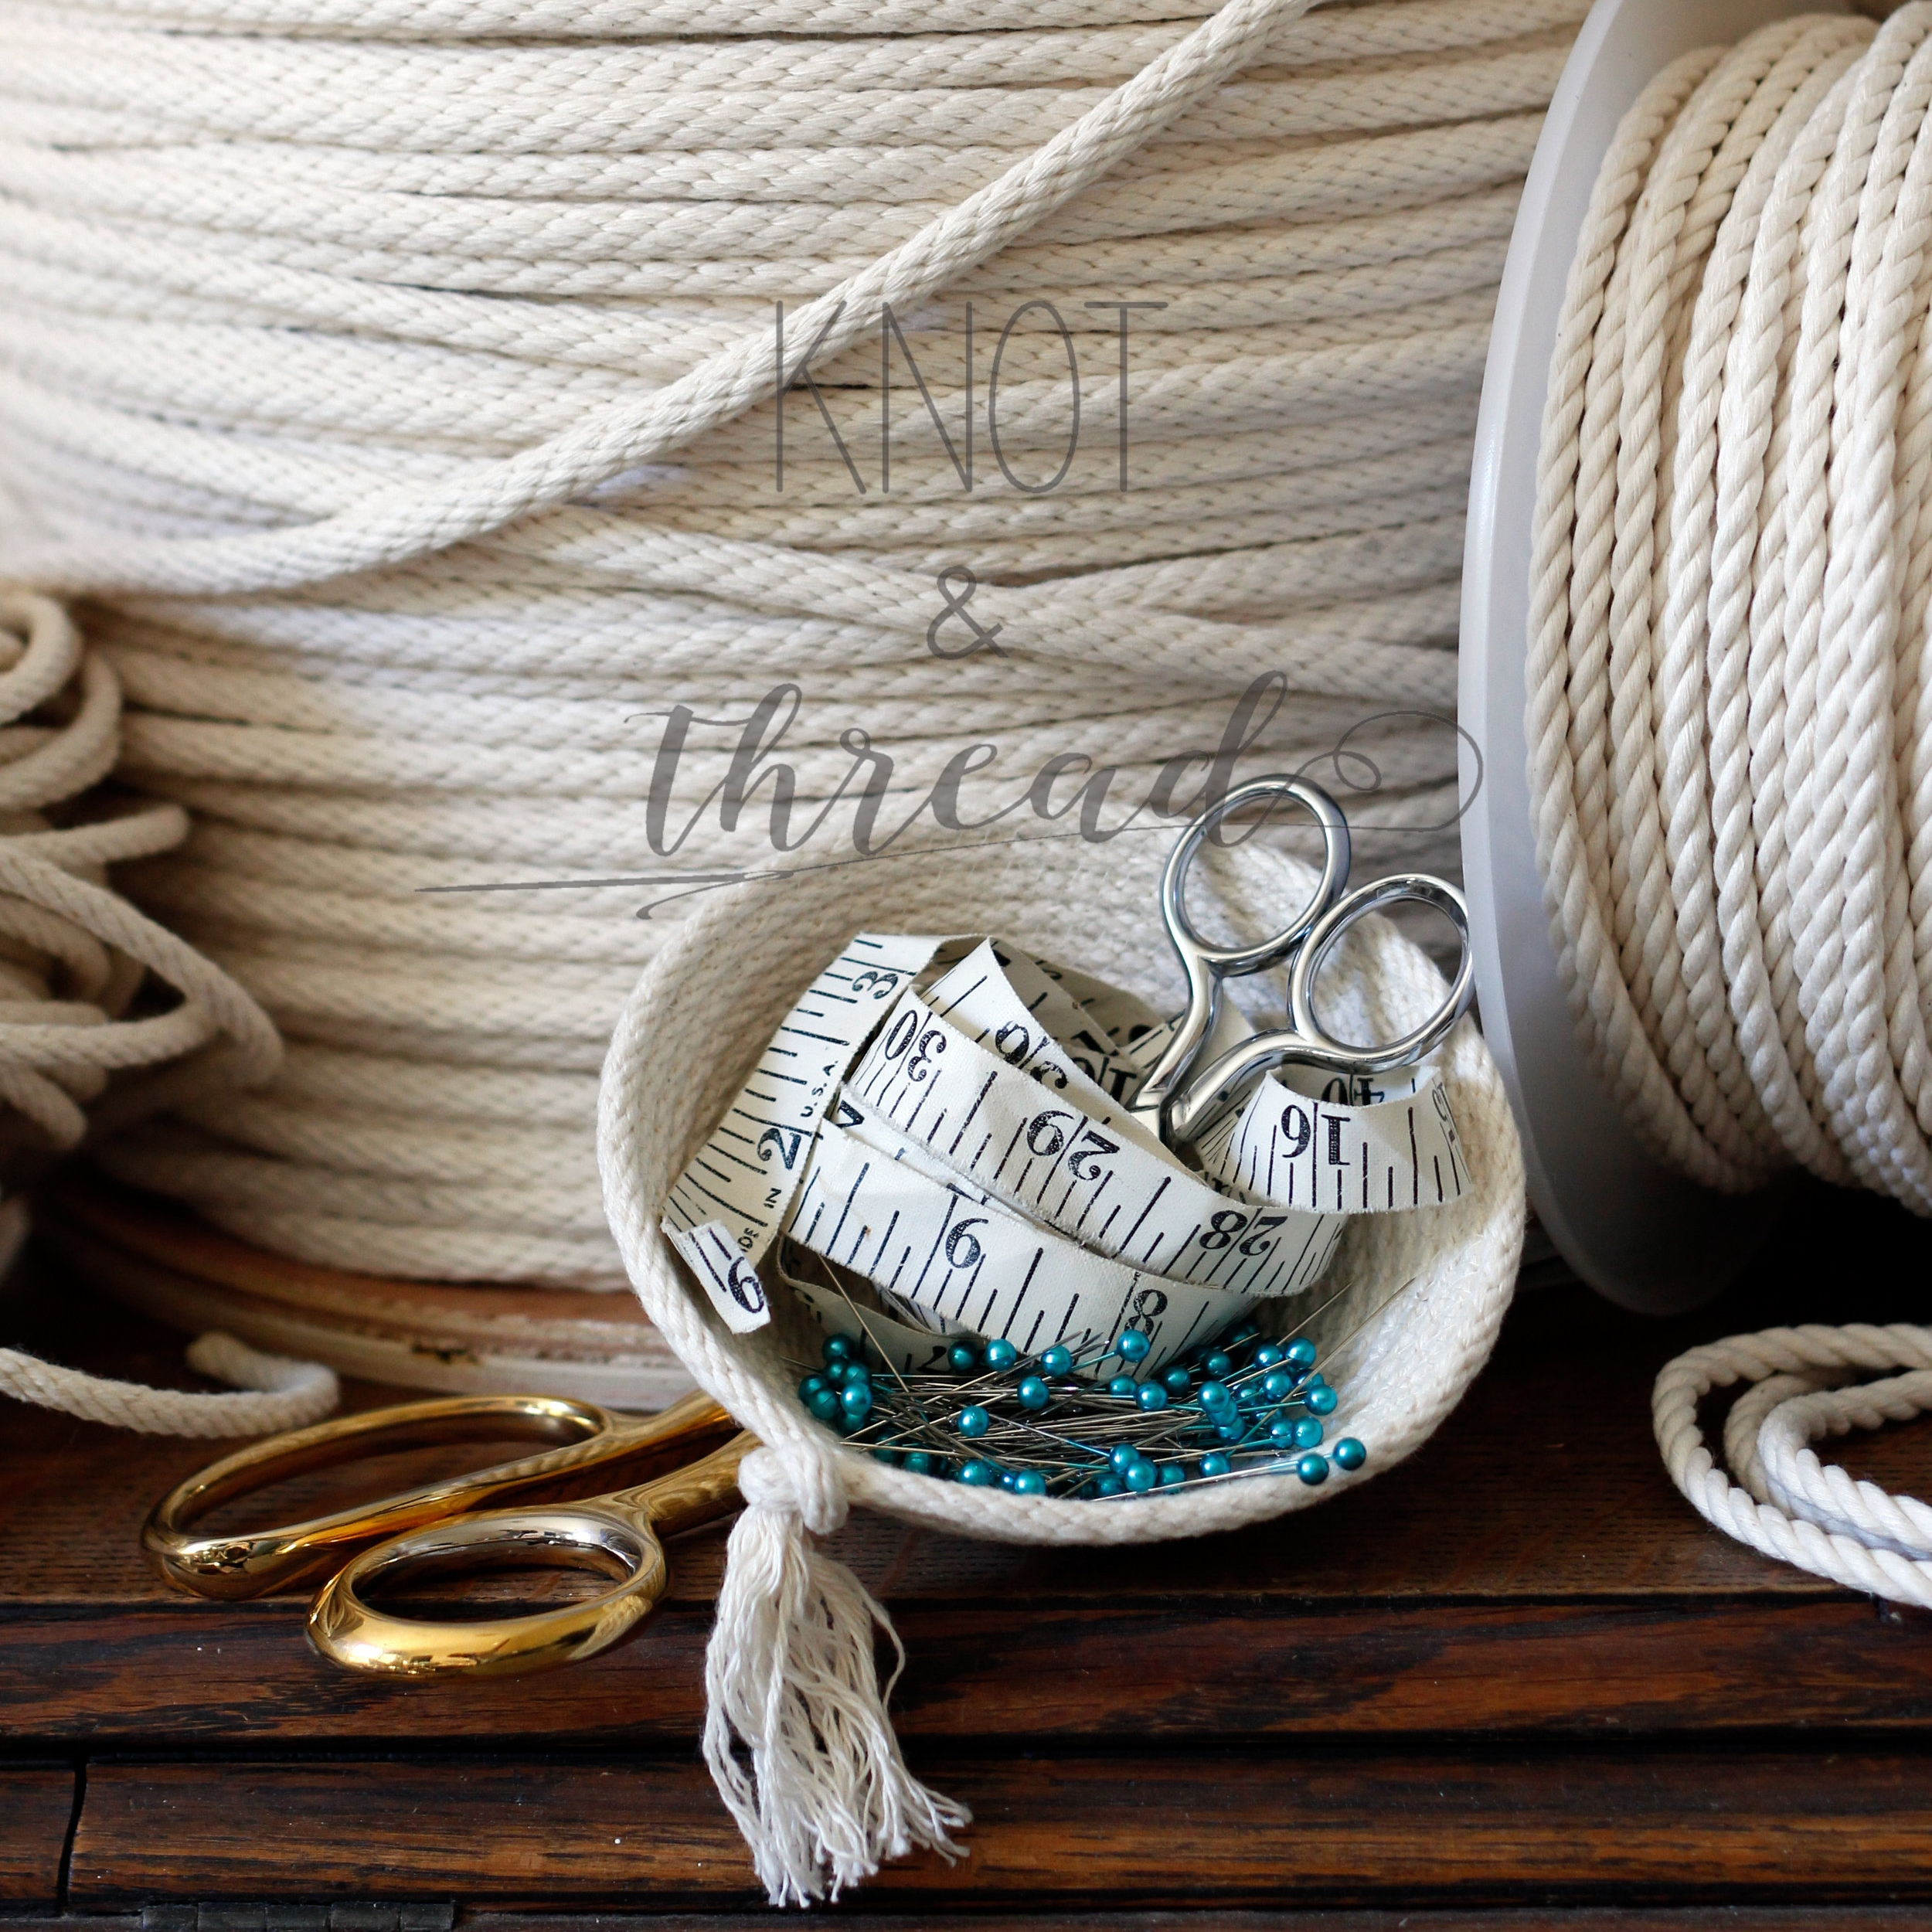 Knot & Thread closeup of rope.JPG